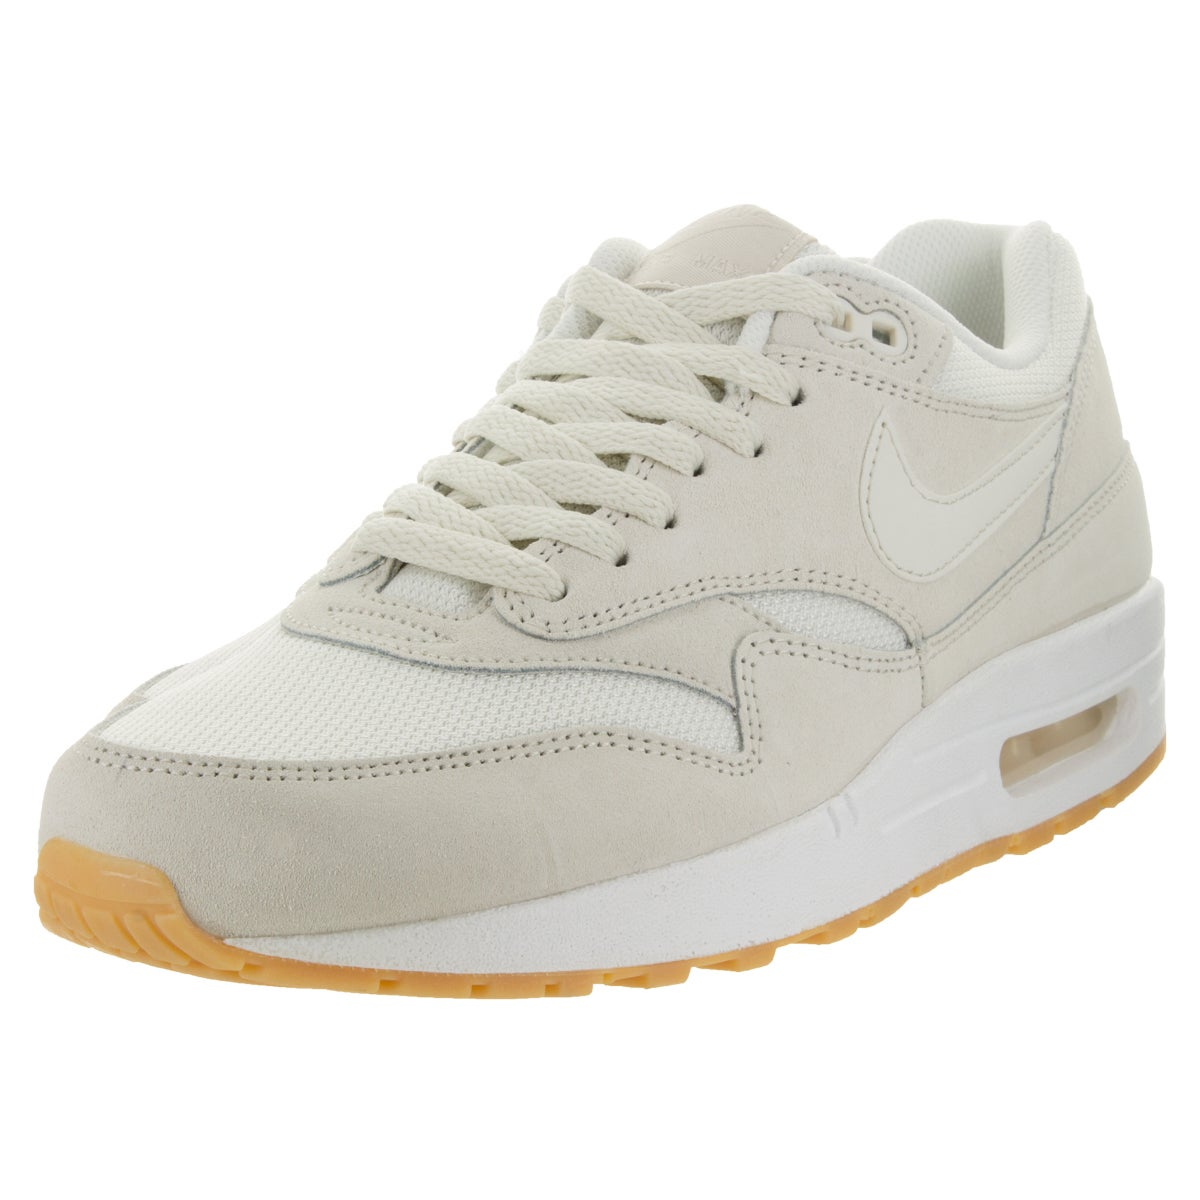 27e6f5f18 Shop Nike Men s Air Max 1 Essential Phantom Phantom White Running Shoe -  Free Shipping Today - Overstock - 12118175